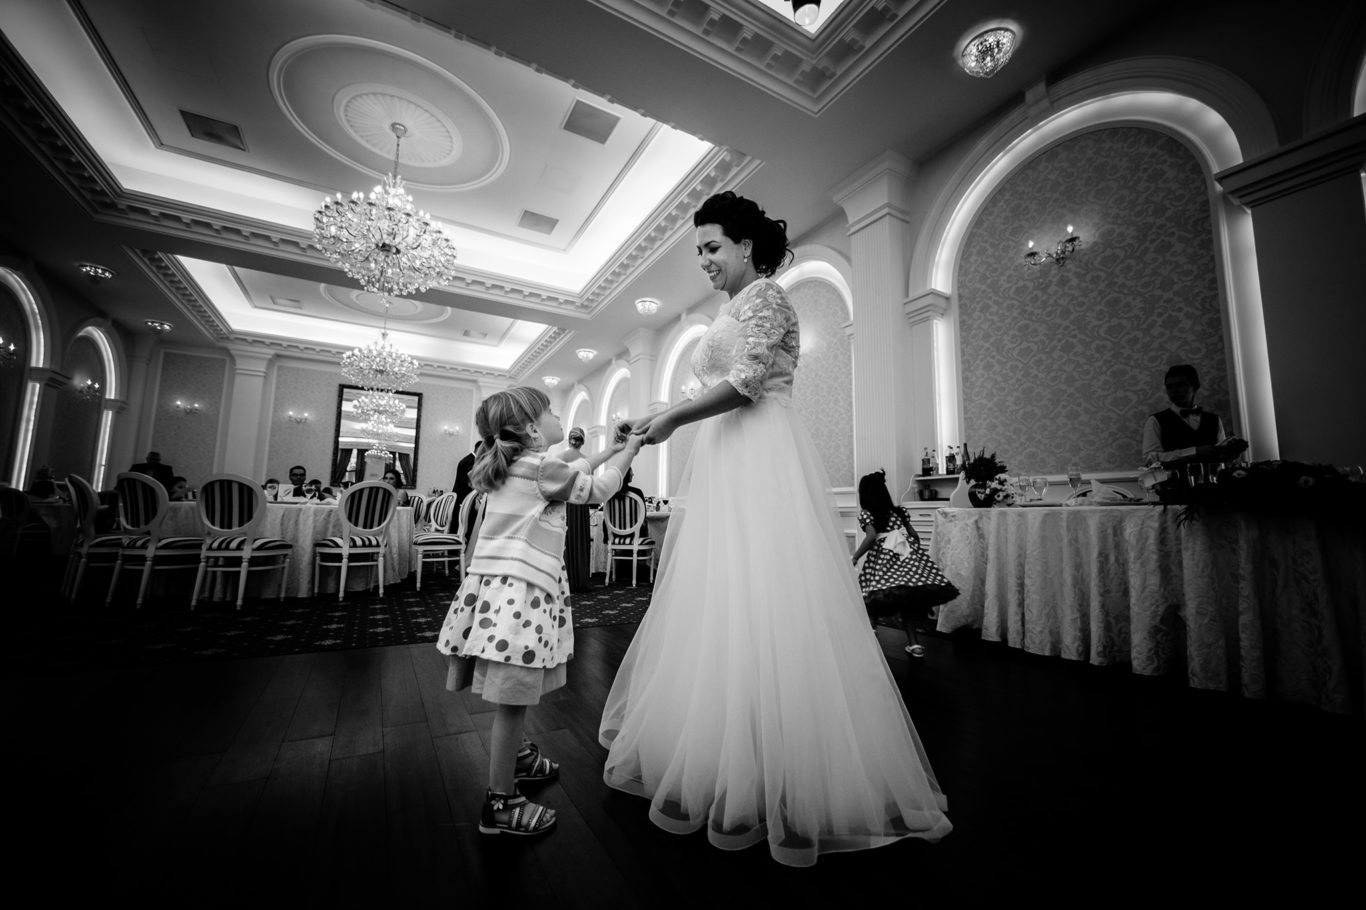 0591-fotografie-nunta-bucuresti-anca-george-fotograf-ciprian-dumitrescu-cdf_0359-3